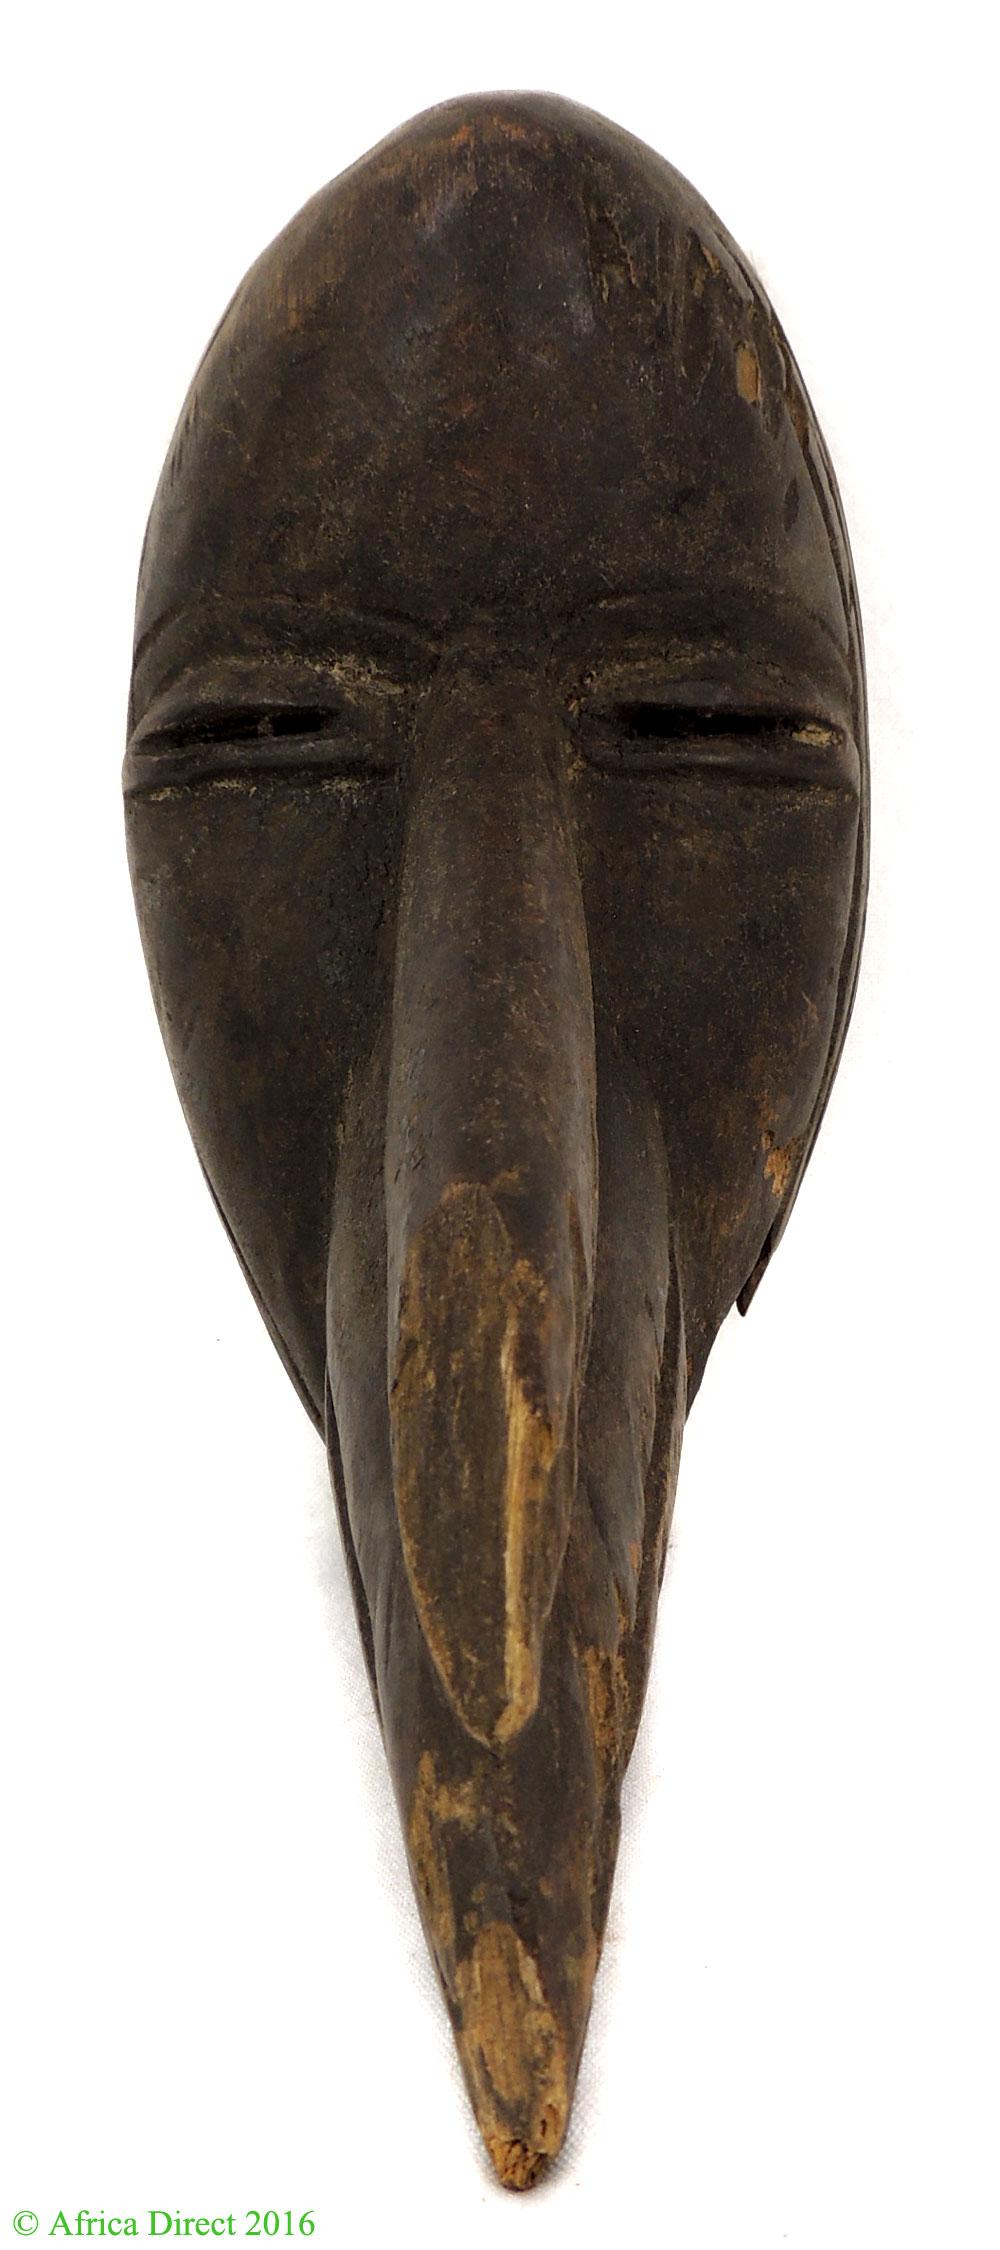 Cross Country Shipping >> Dan Bird Mask with Beak Liberia African Art - Dan, Bassa, Kran, Wee - African Masks